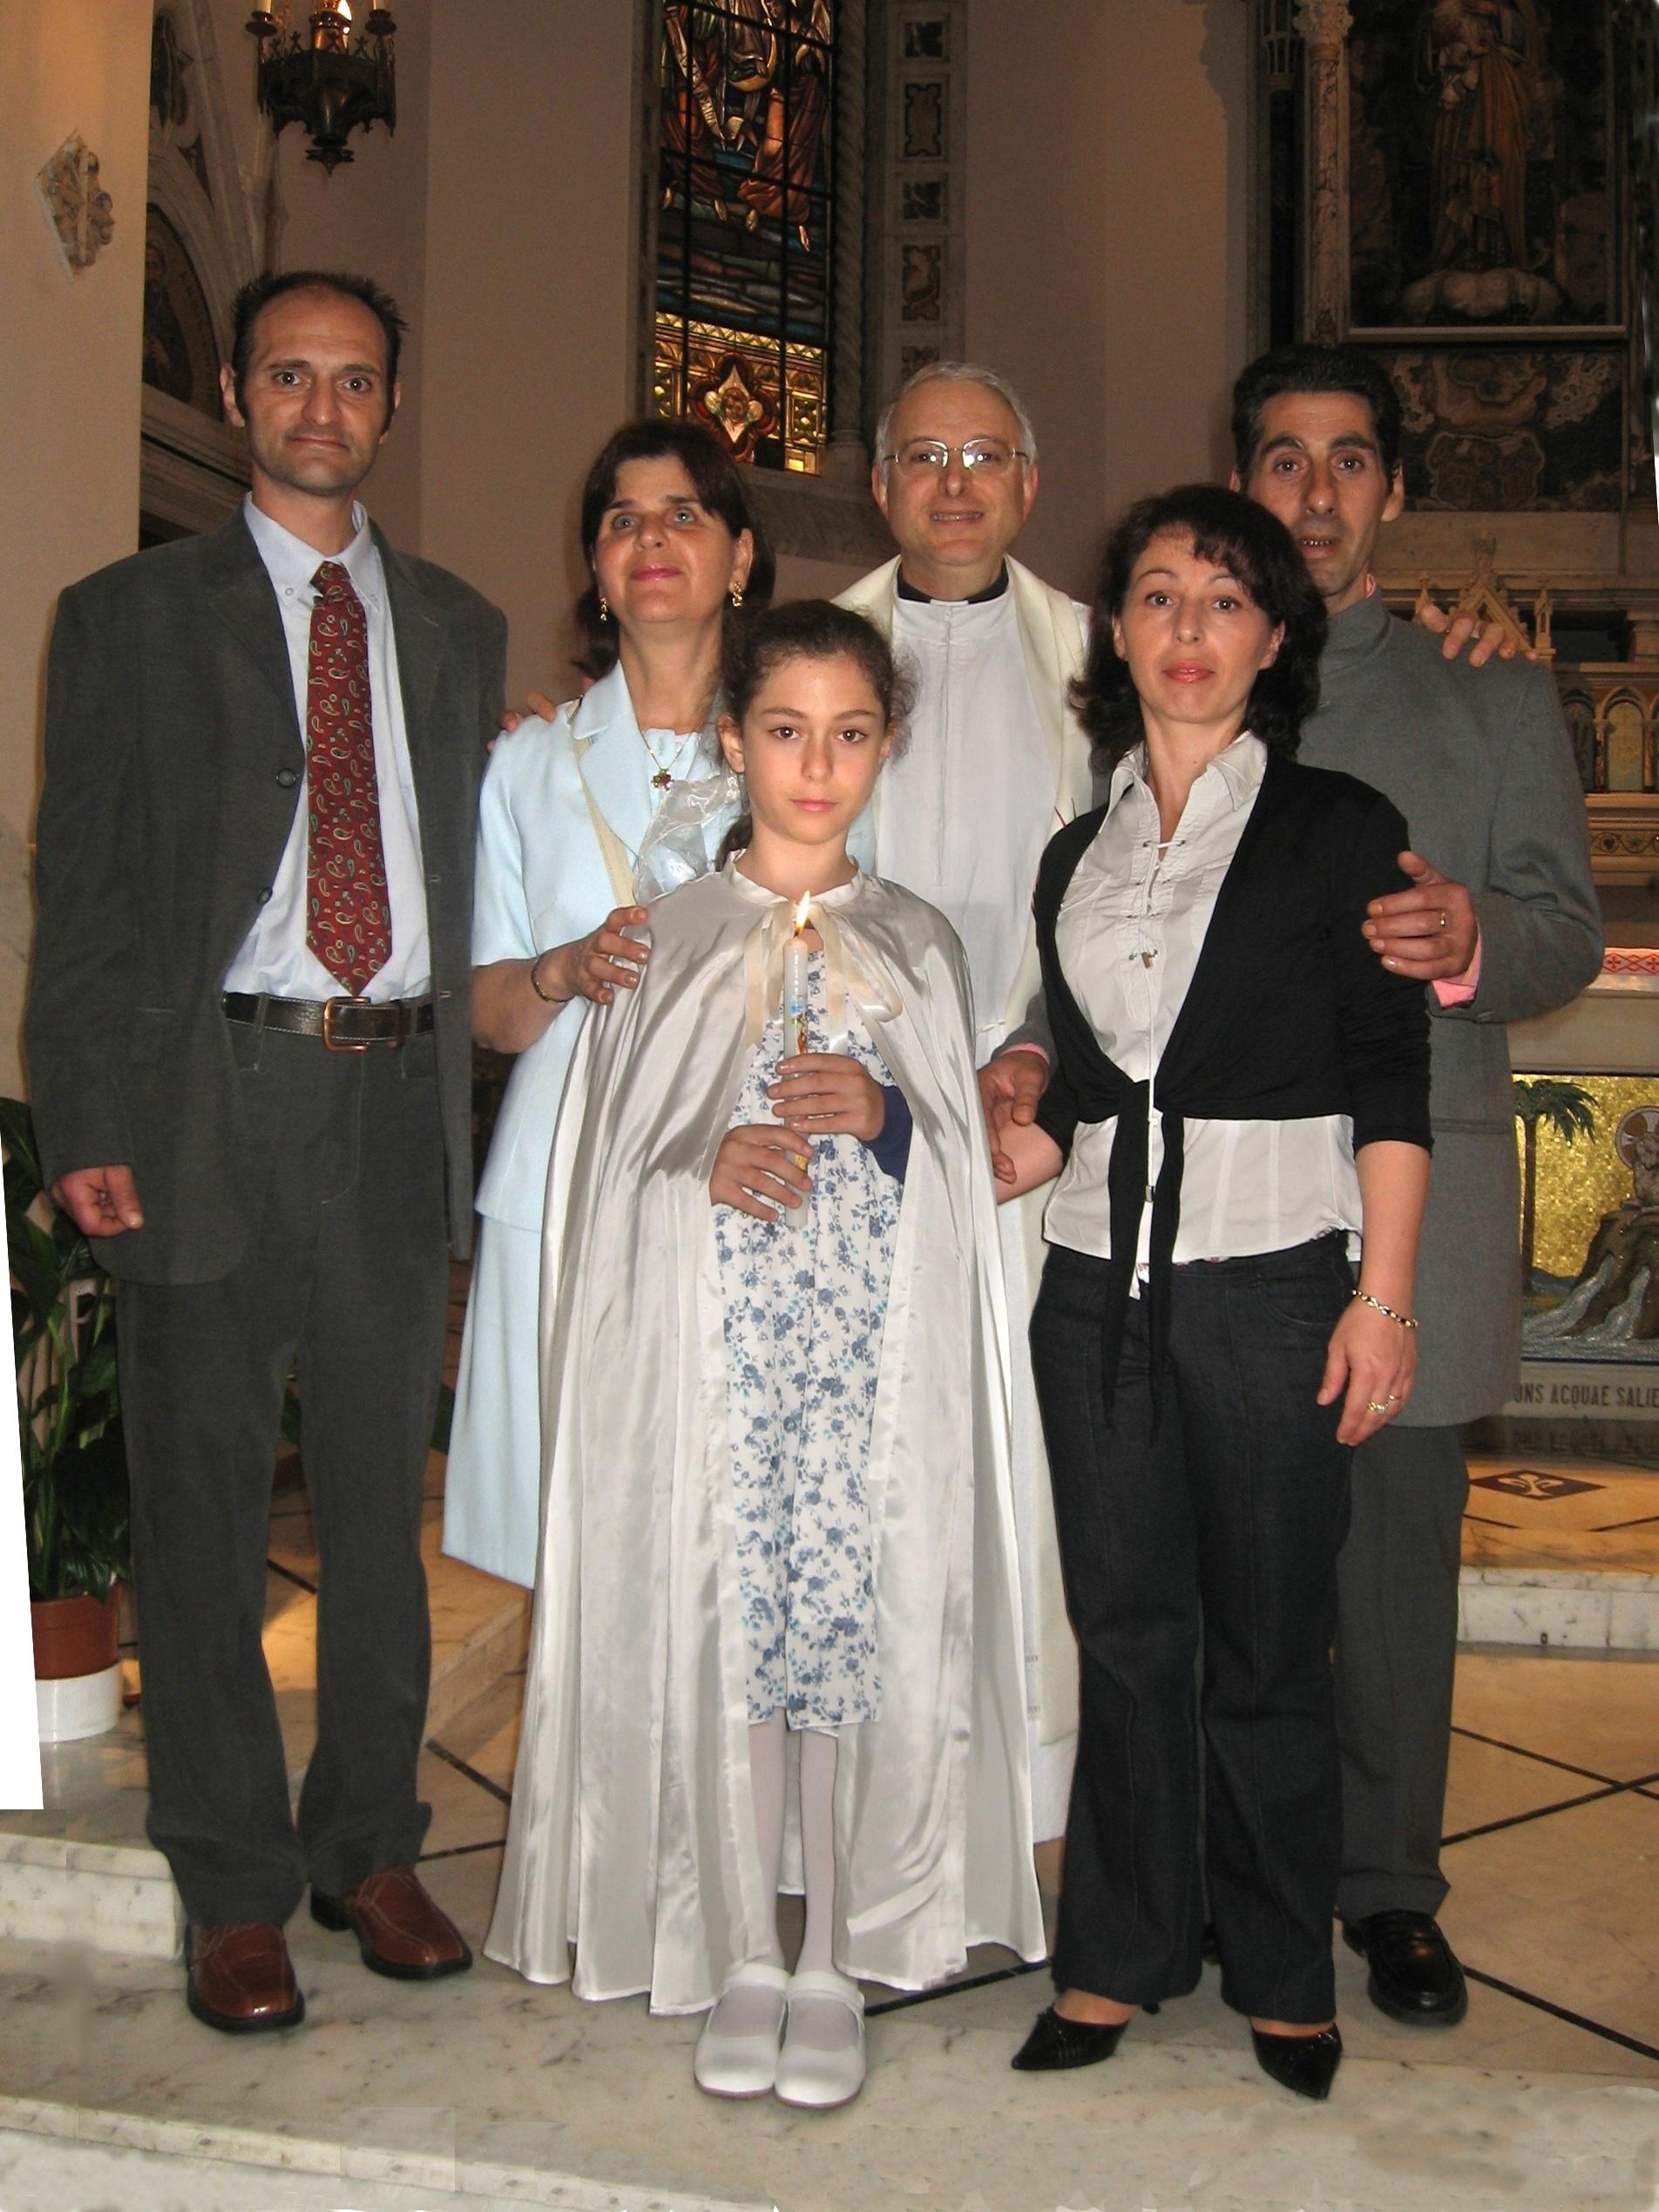 Battesimo_Jasmine_Romagnolo_10-05-22--11.28.57